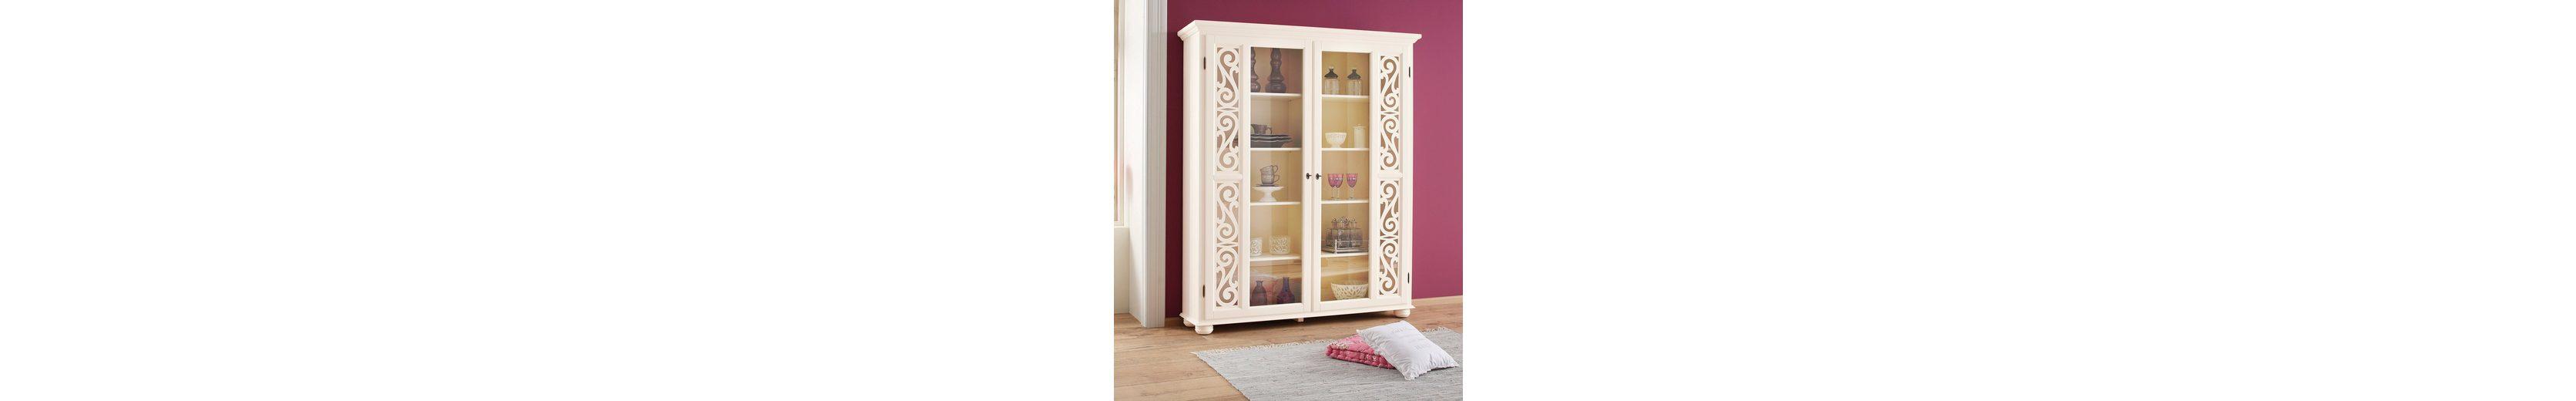 Premium collection by Home affaire Vitrine »Arabeske«, Höhe 190 cm